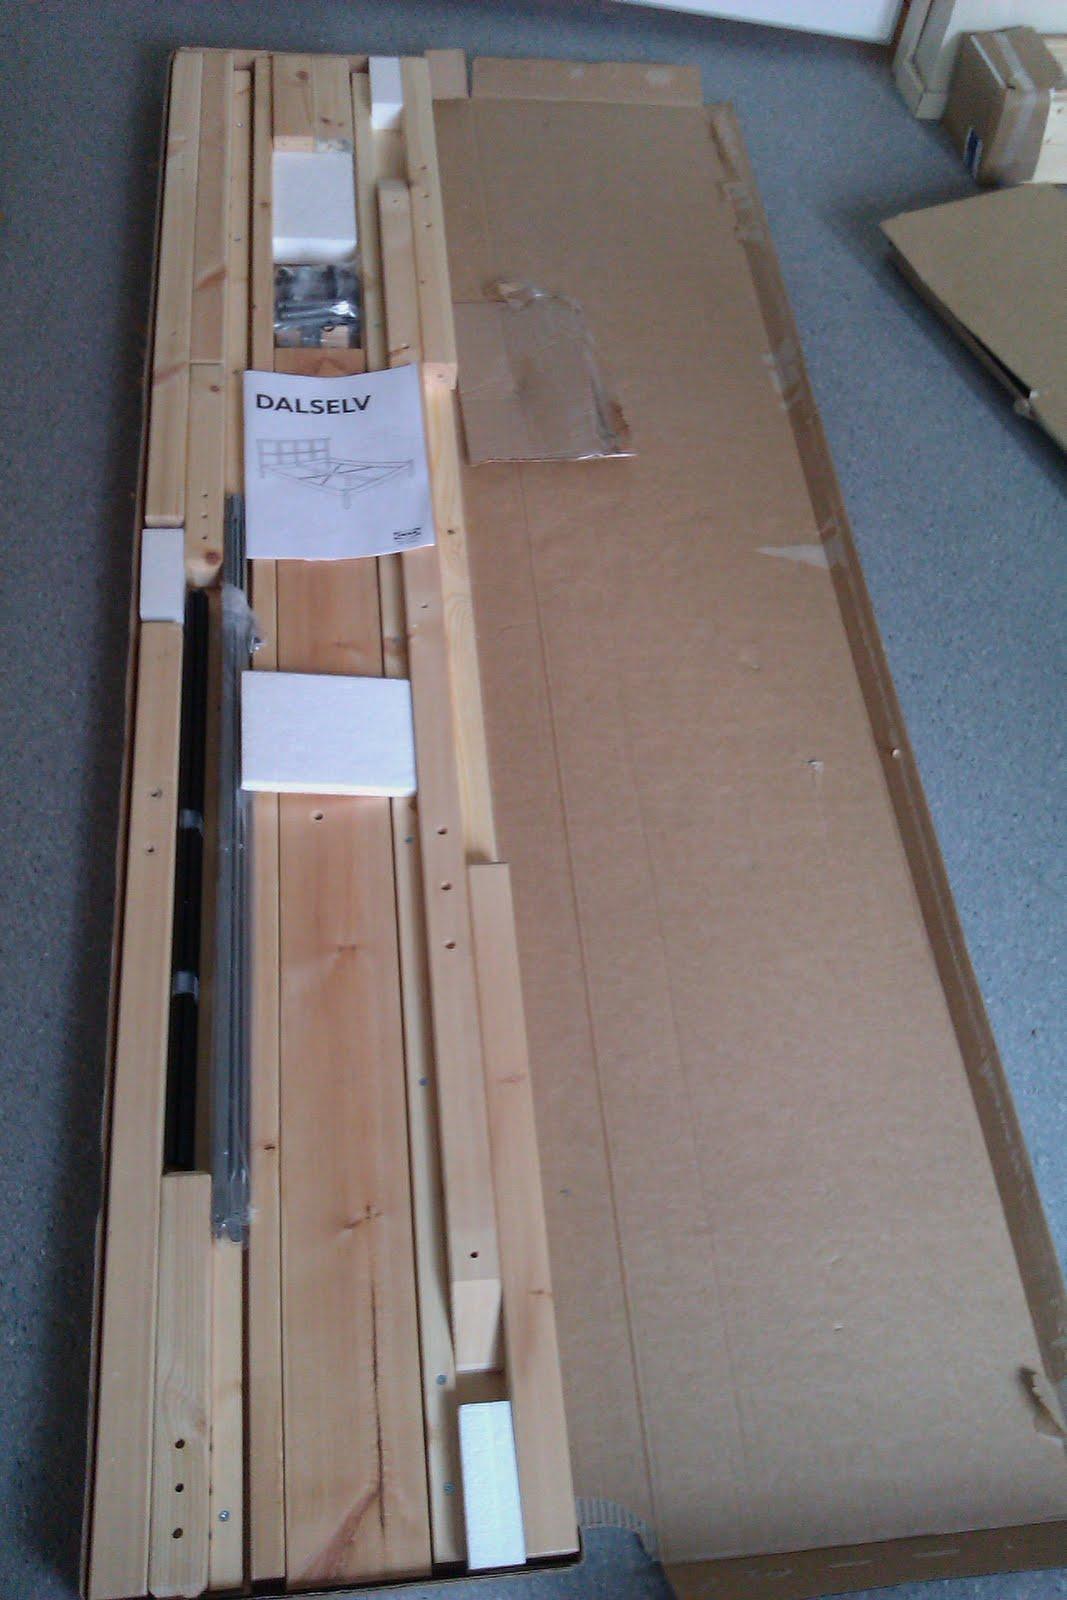 How To Take Apart Ikea Bed - minimalist interior design